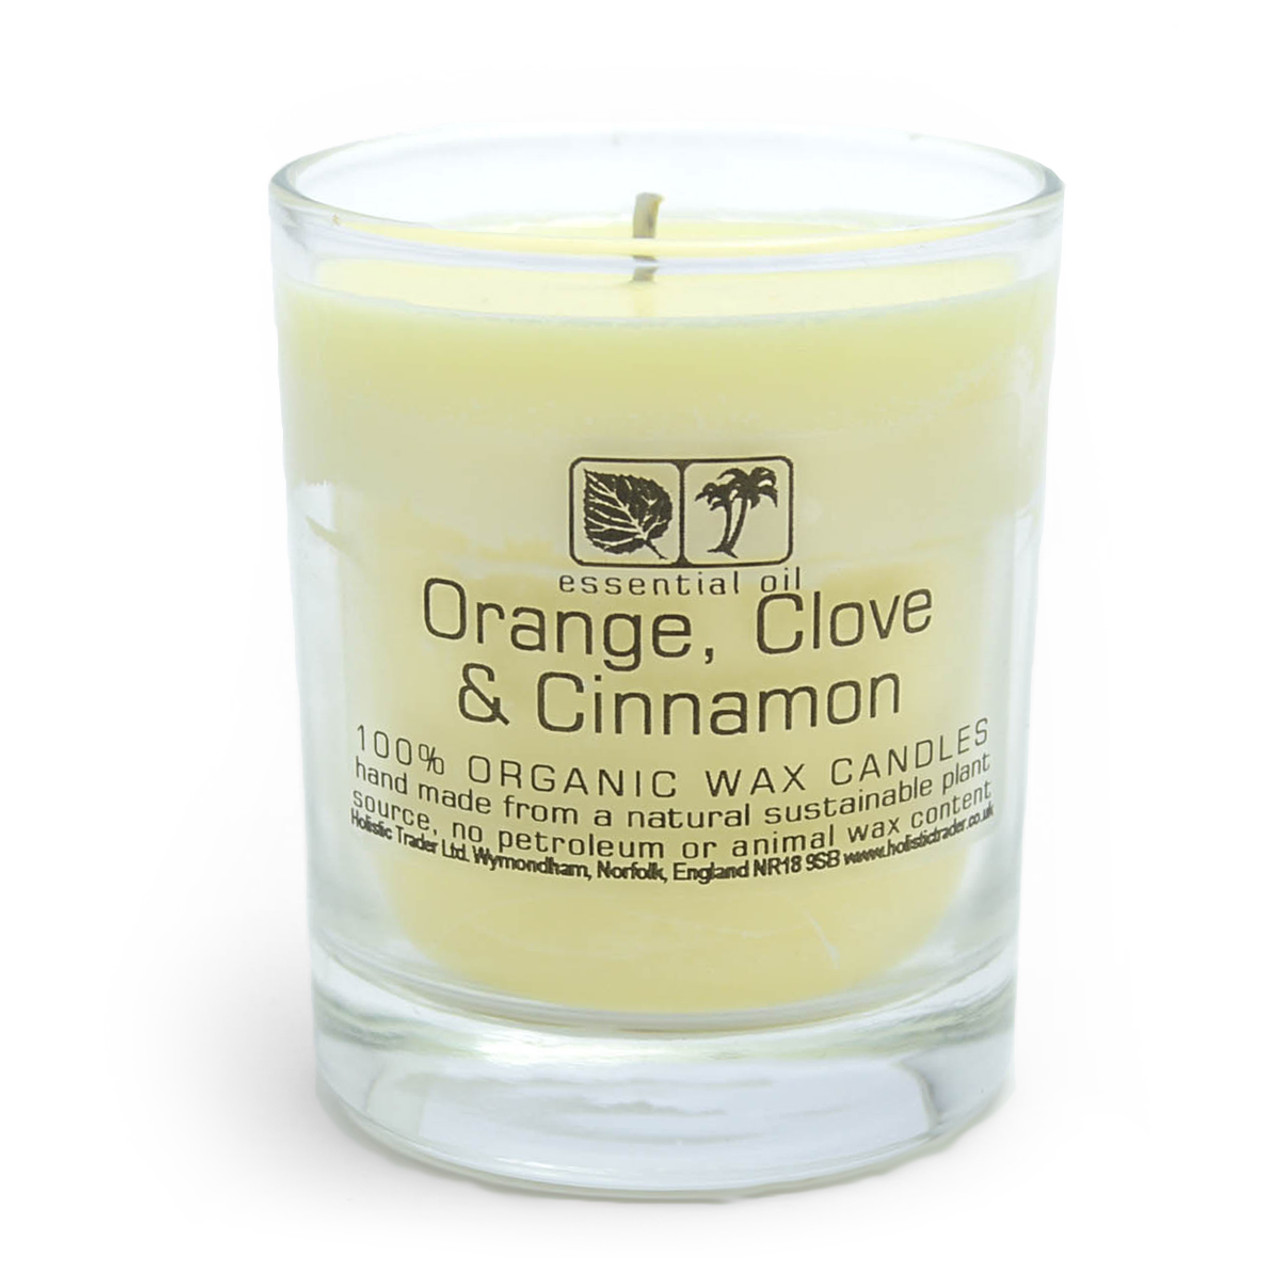 Orange & Cinnamon Aromatherapy Candle (Large, 40-50 Hours)